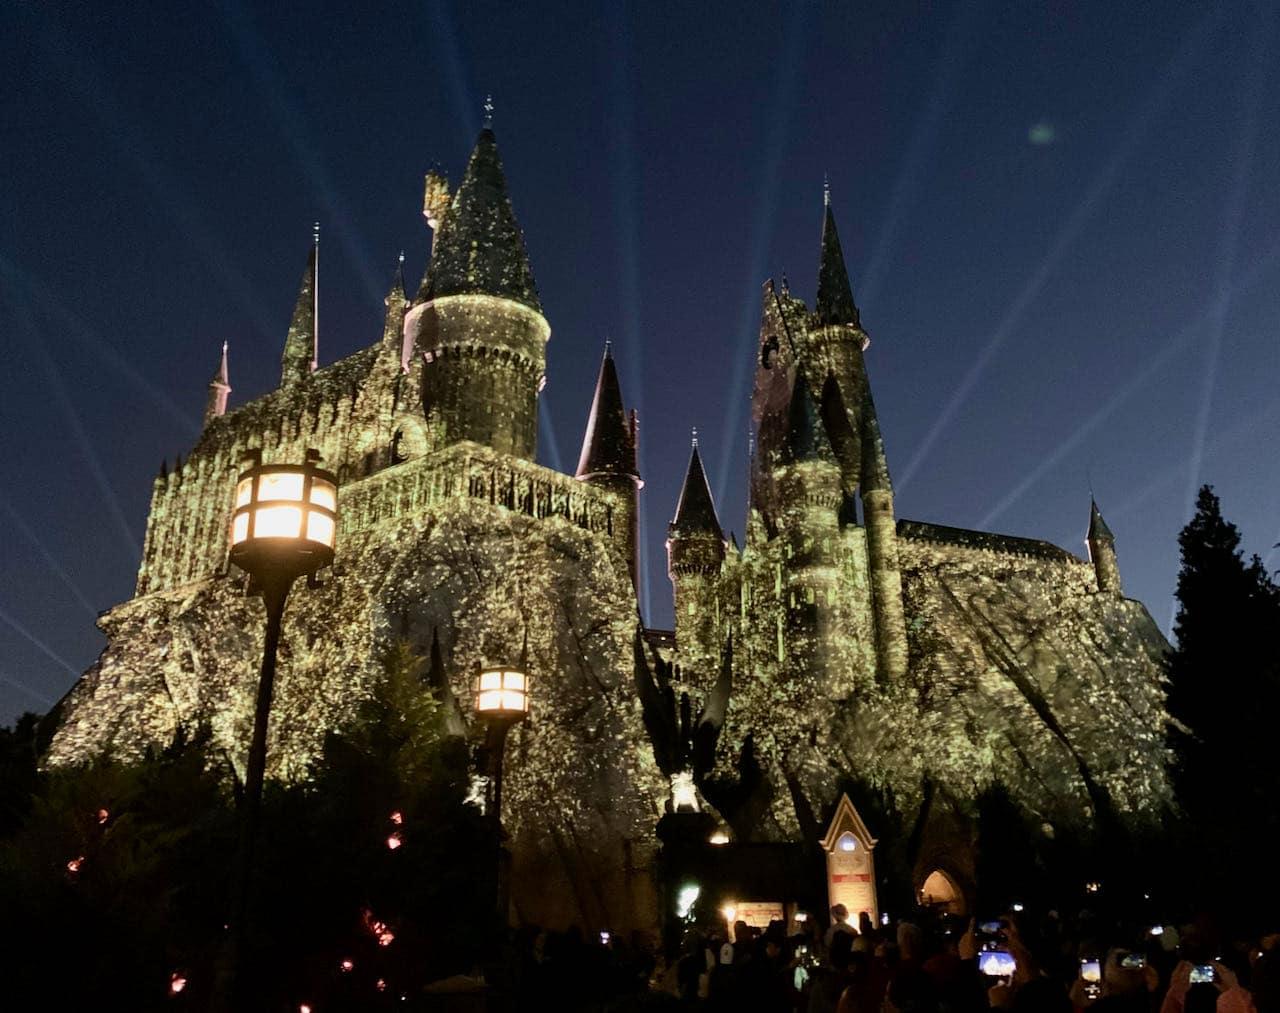 The Wizarding World of Harry Potter Universial Studios Orlando